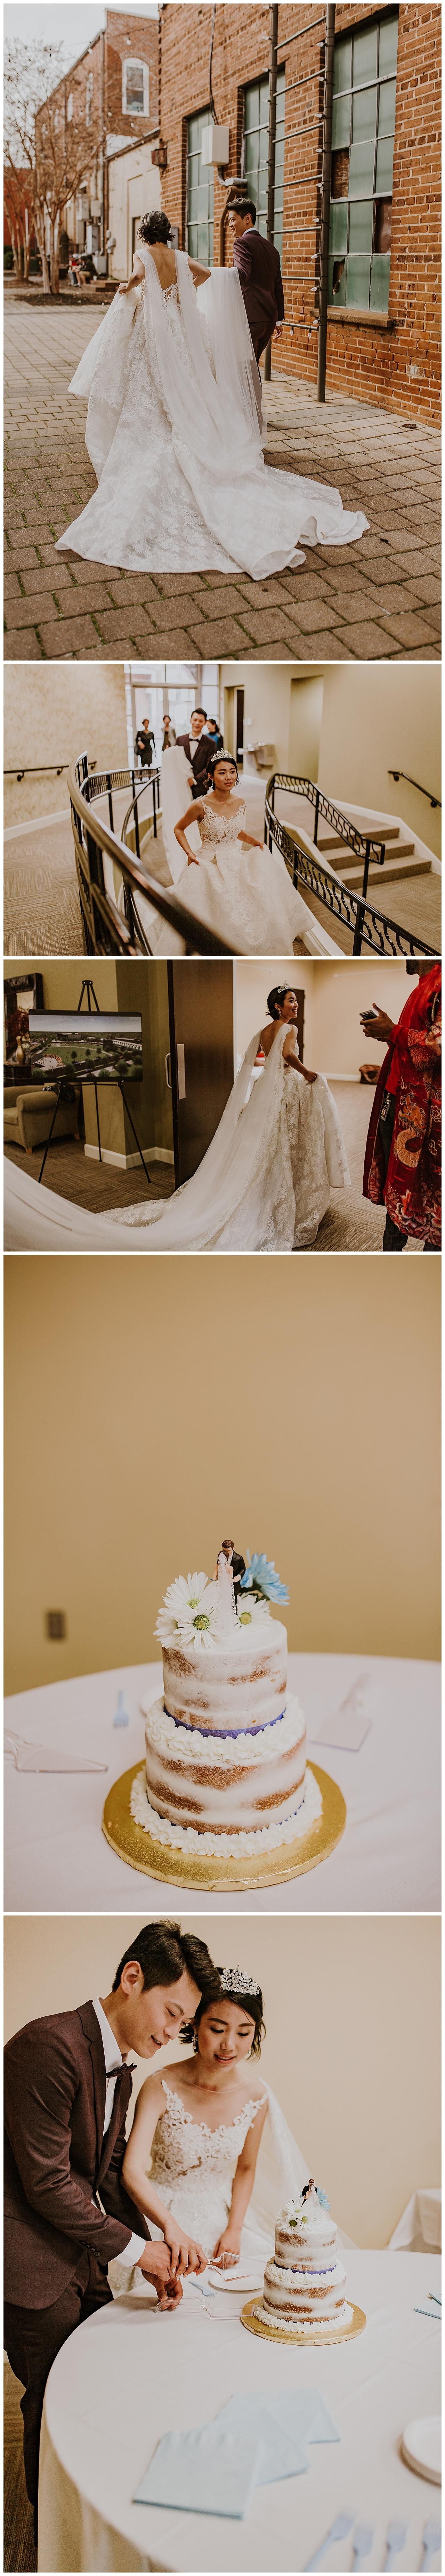 DOUGLASVILLE_GEORGIA_WEDDING_PHOTOGRAPHER_ELOPEMENT_ATLANTA_NATURAL_LIGHT_MOODY_SUNNY_0009.jpg